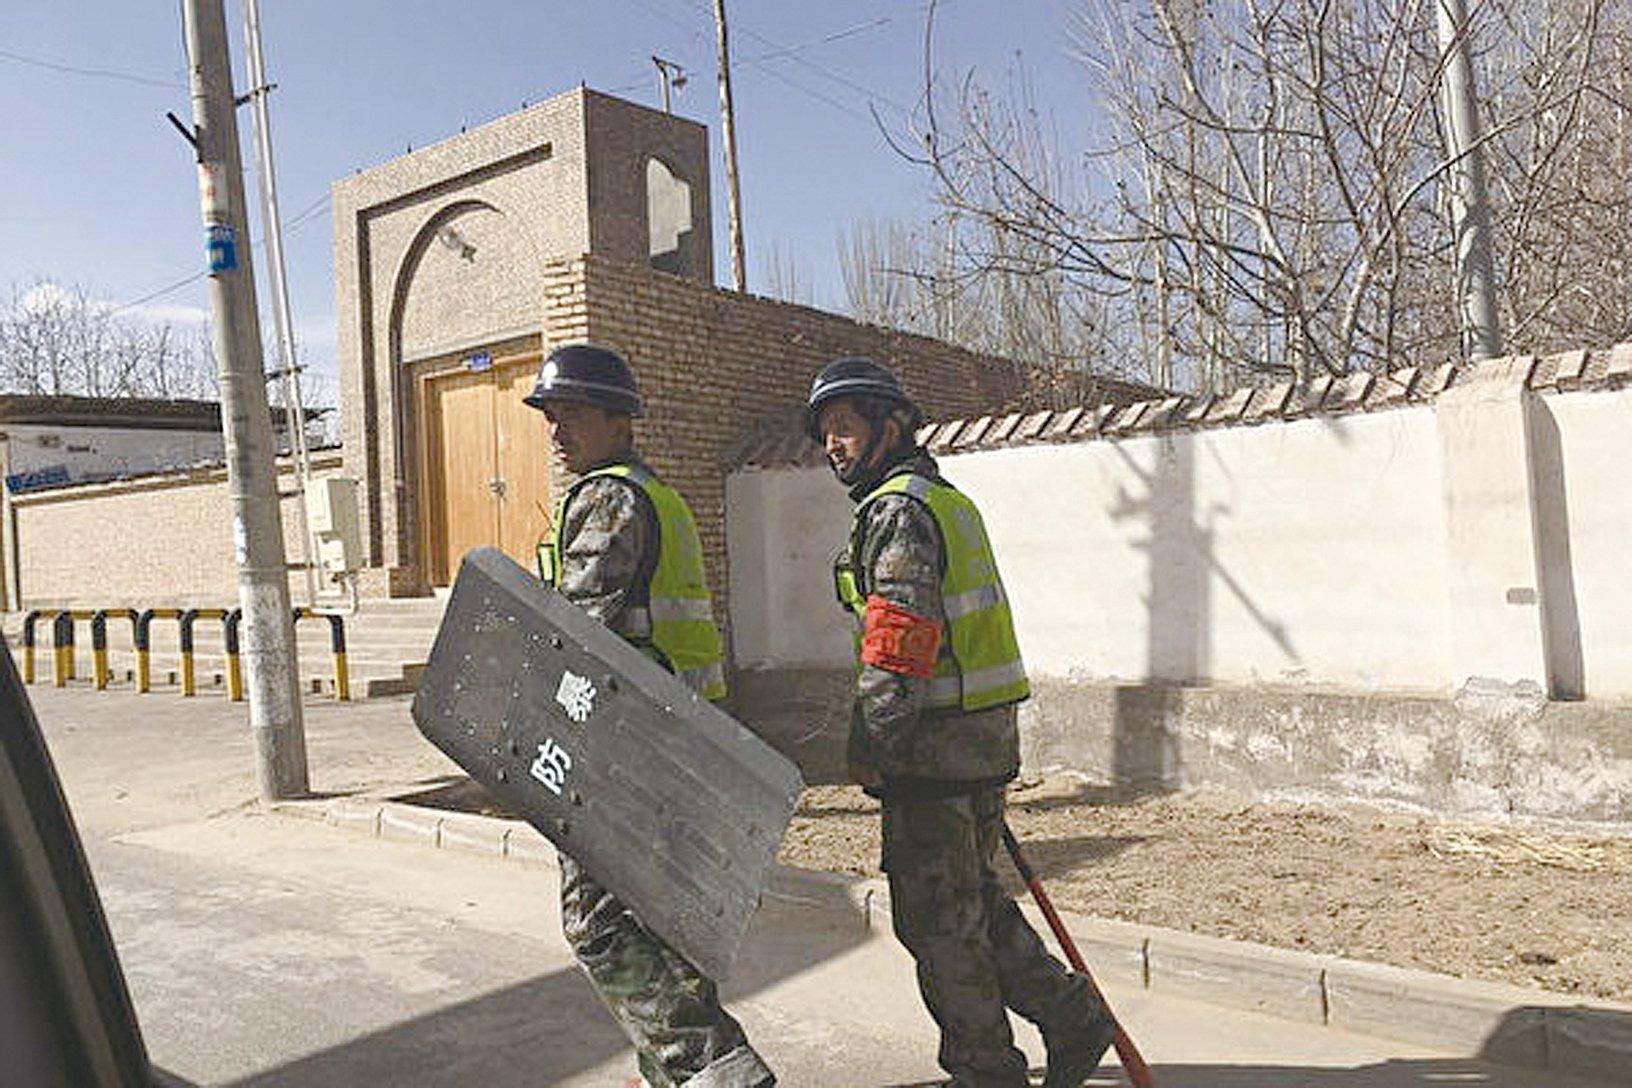 圖為2018年2月17日,新疆和田街上巡邏的警察。(BEN DOOLEY/AFP/Getty Images)